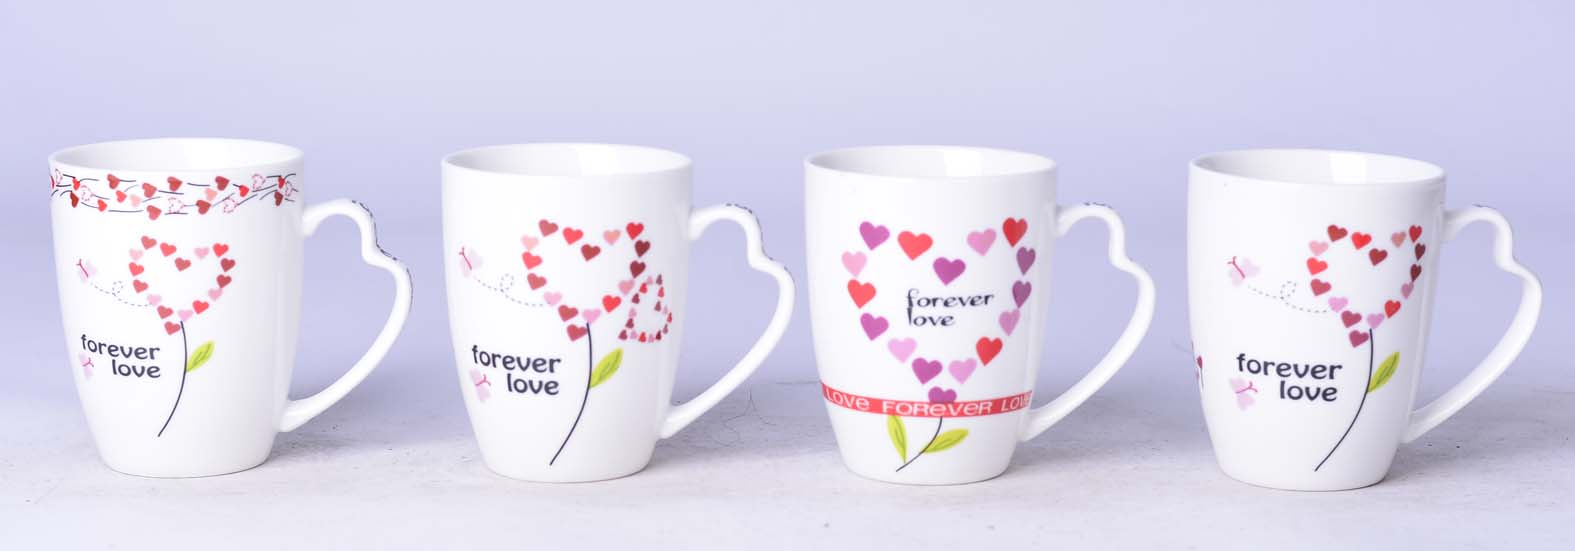 Coffee mug wedding favors - Wedding Favors Mugs Wedding Favors Mugs Suppliers And Manufacturers At Alibaba Com